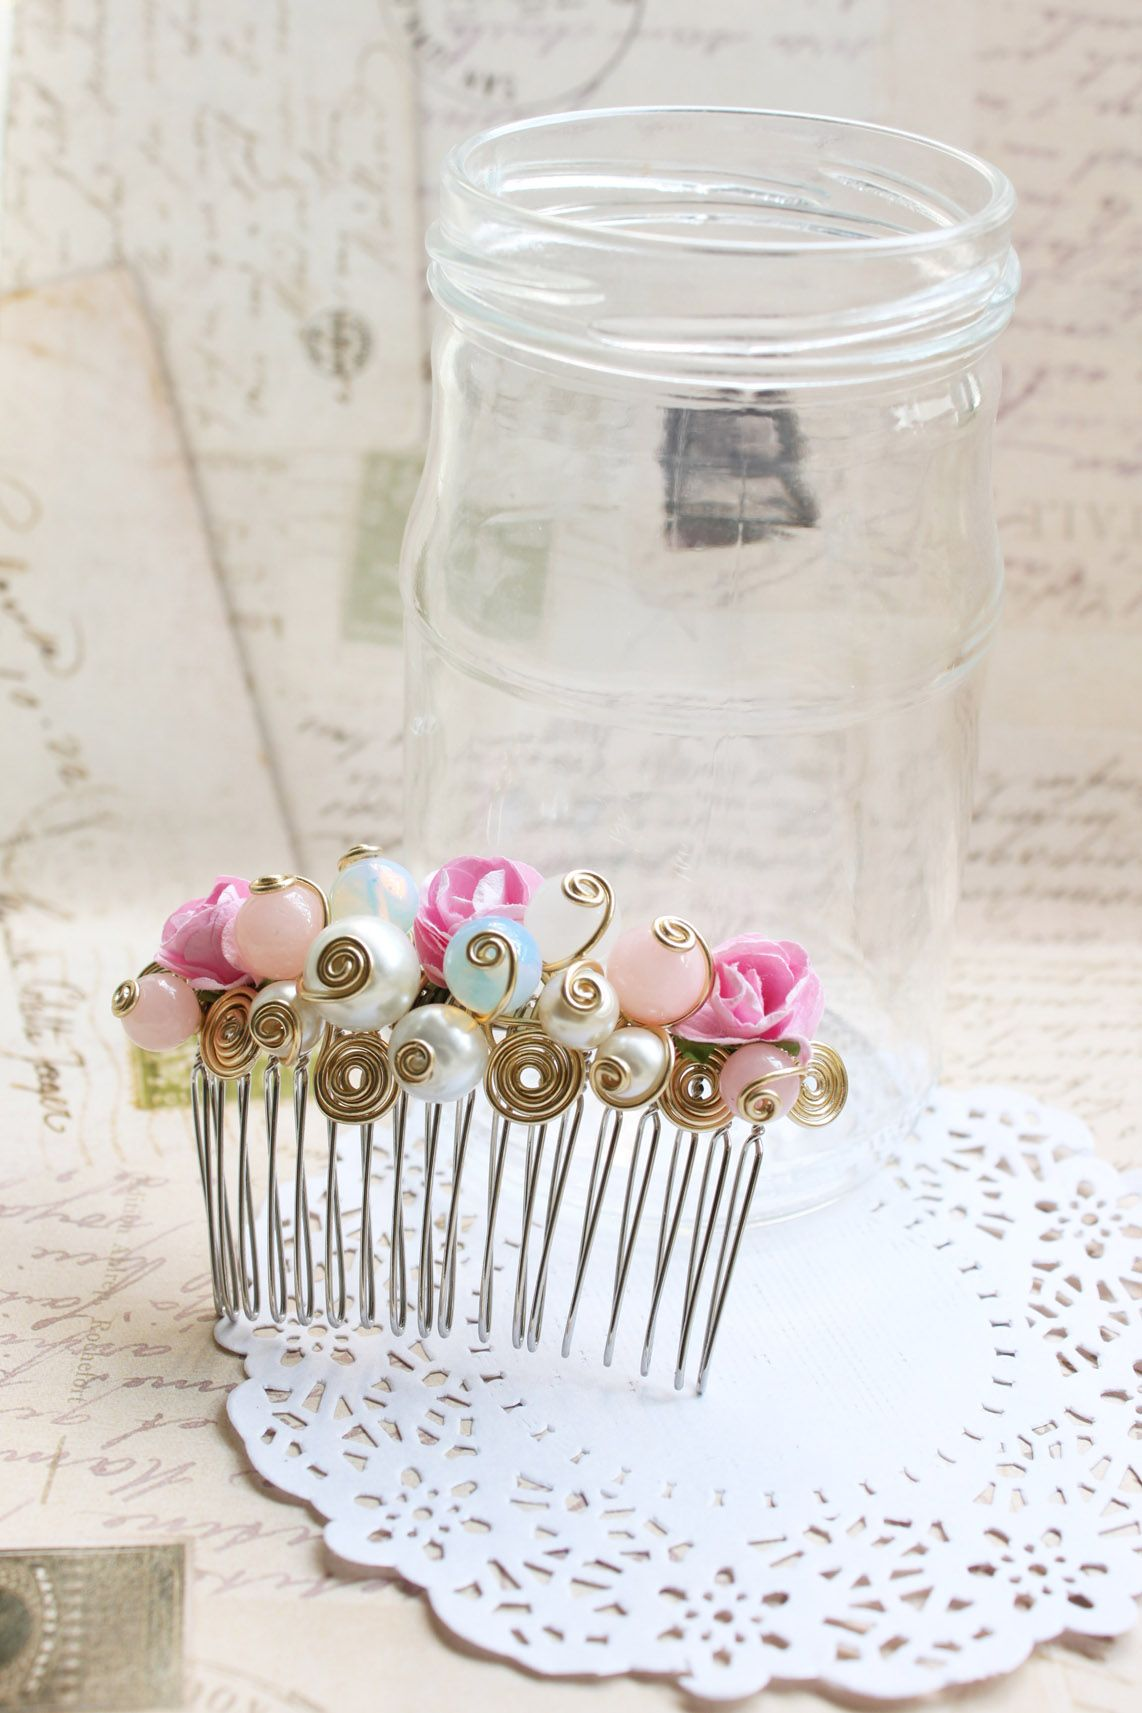 handmade pink hair accessories